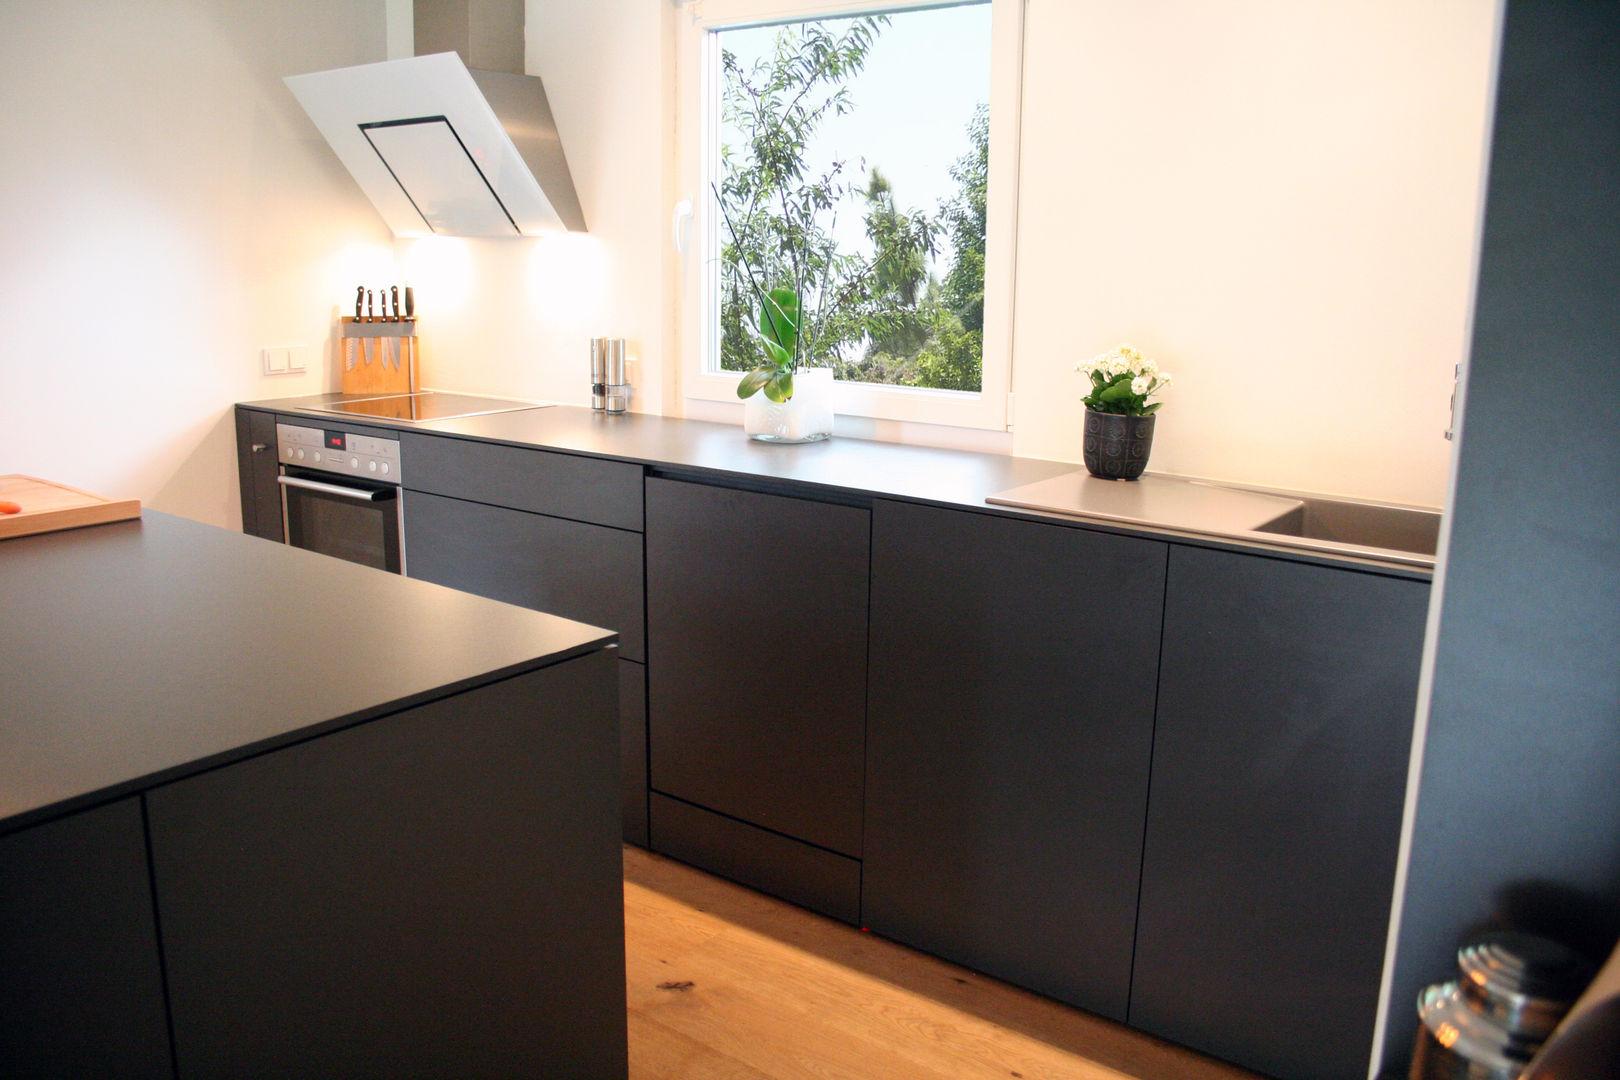 k che reizvoll k che ohne oberschr nke entw rfe anmutig k che k chentr ume 23qm stil. Black Bedroom Furniture Sets. Home Design Ideas